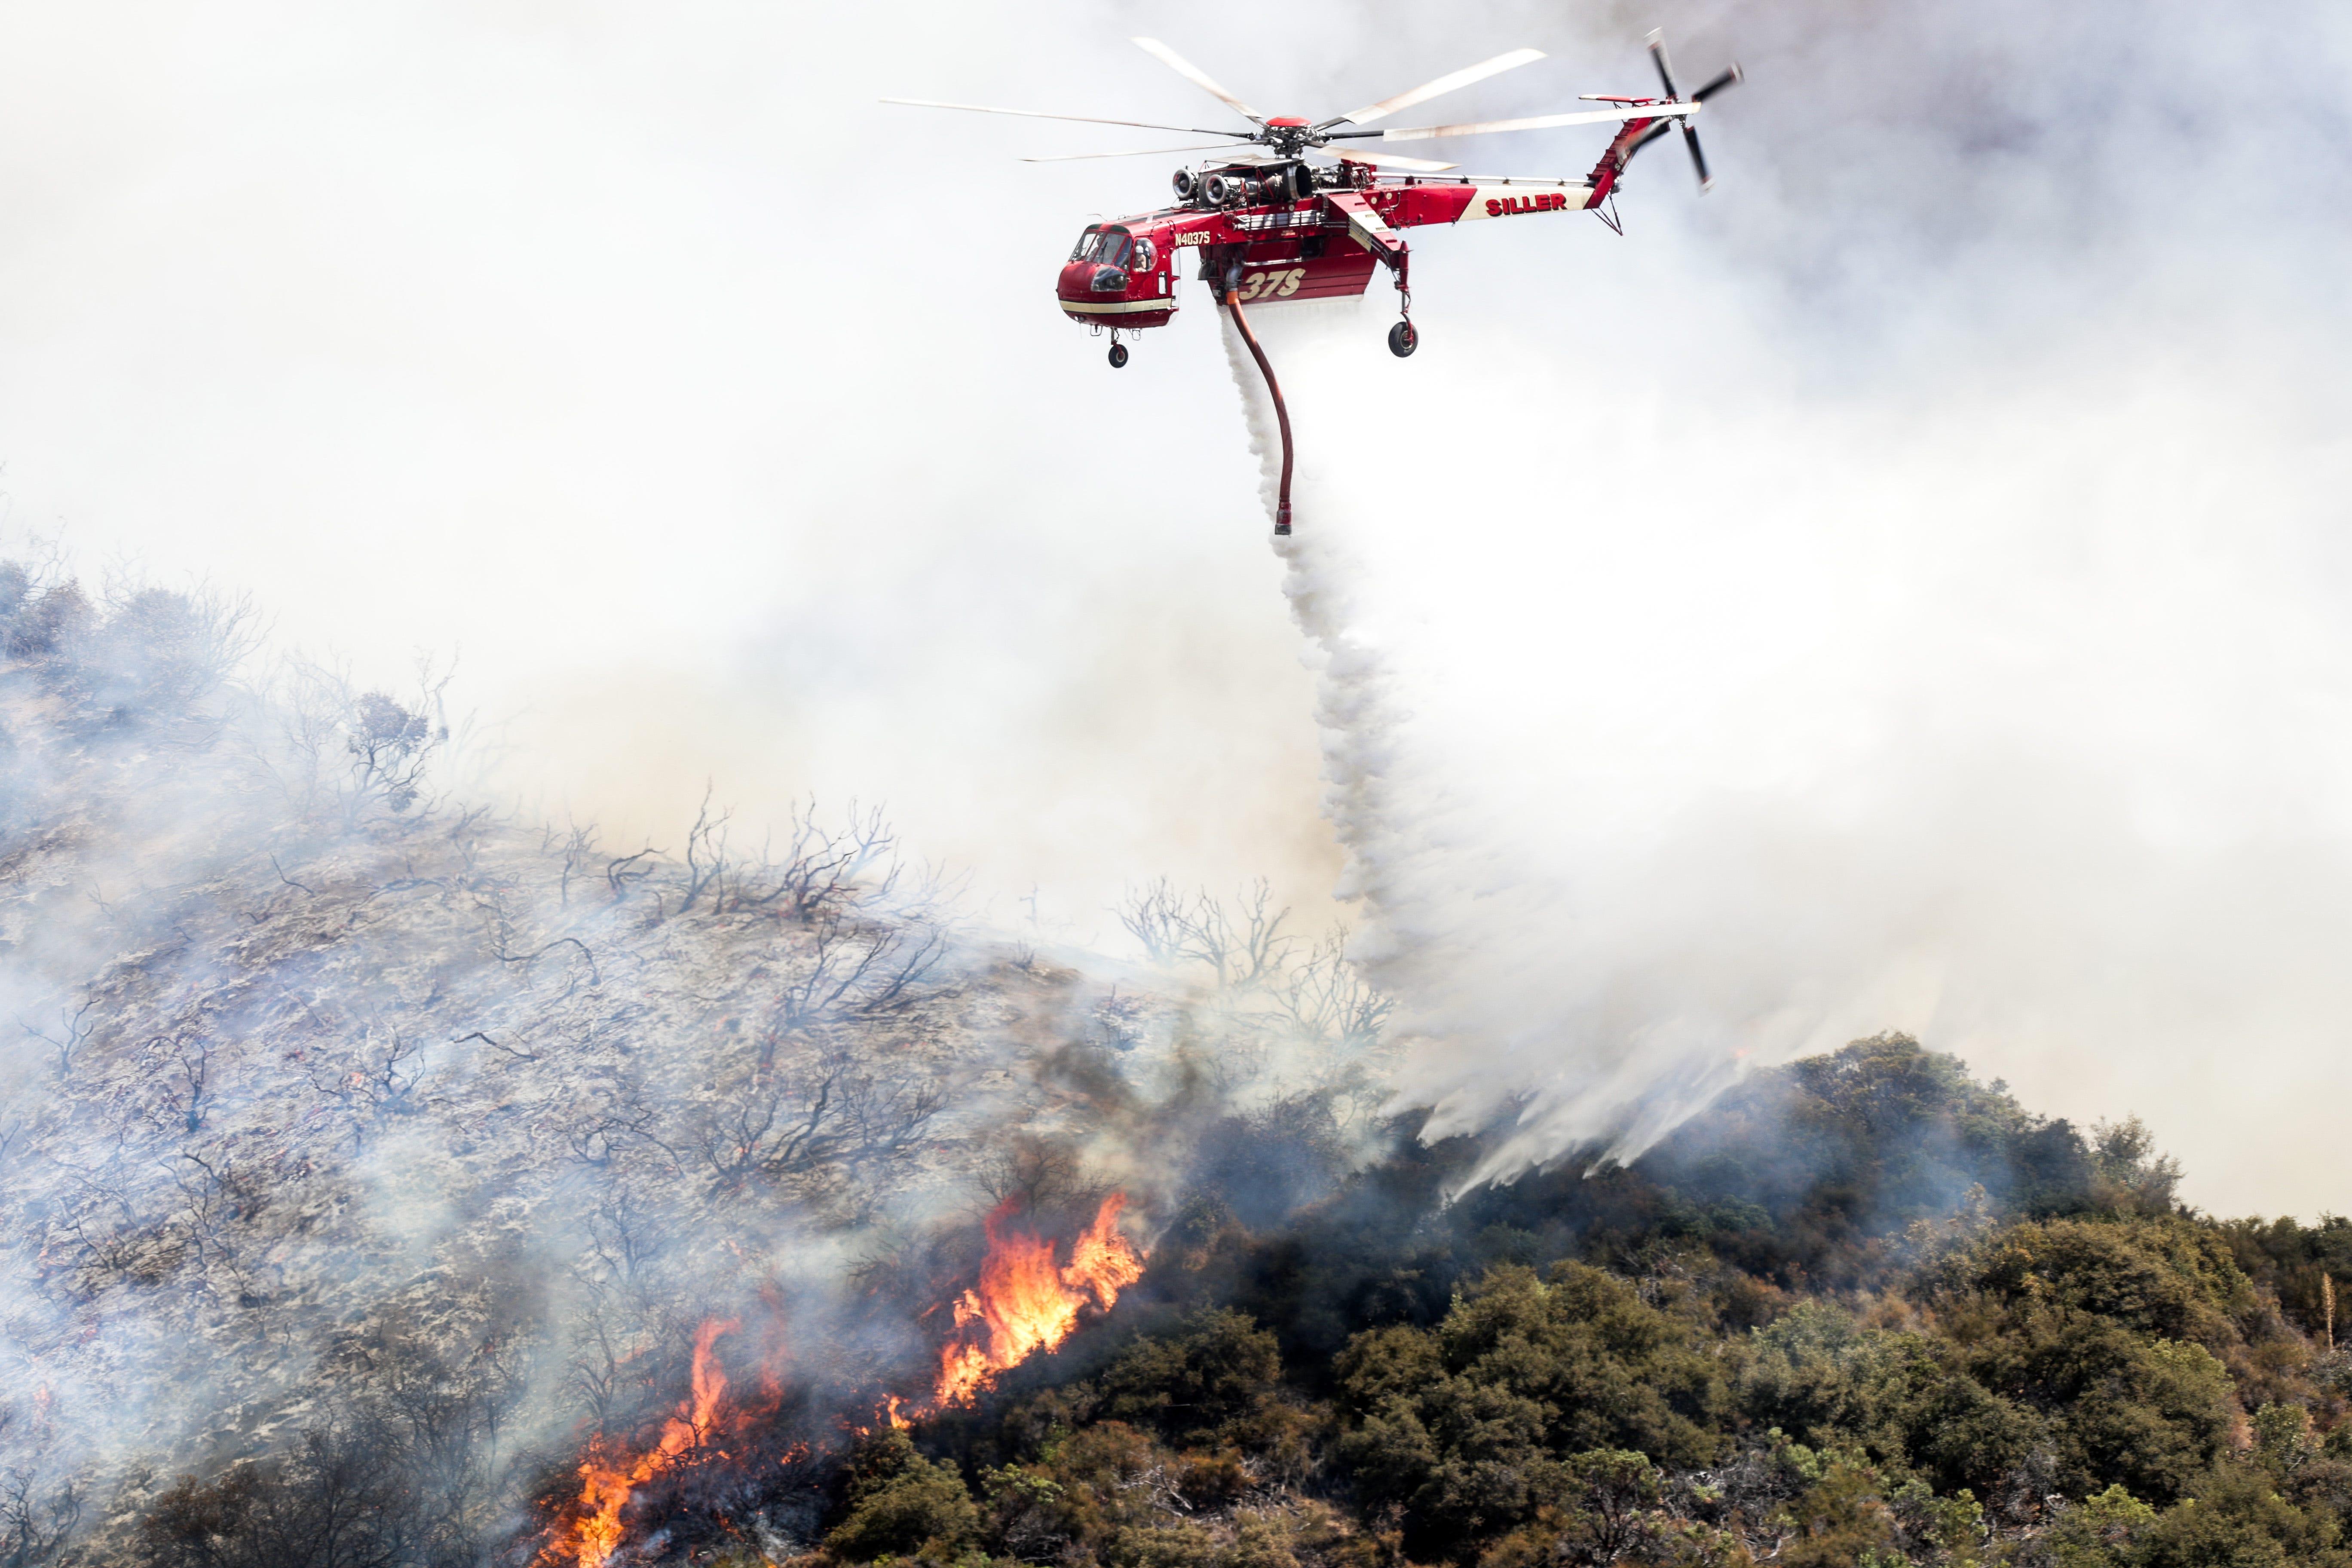 Fire officials: El Dorado blaze sparked during gender reveal party